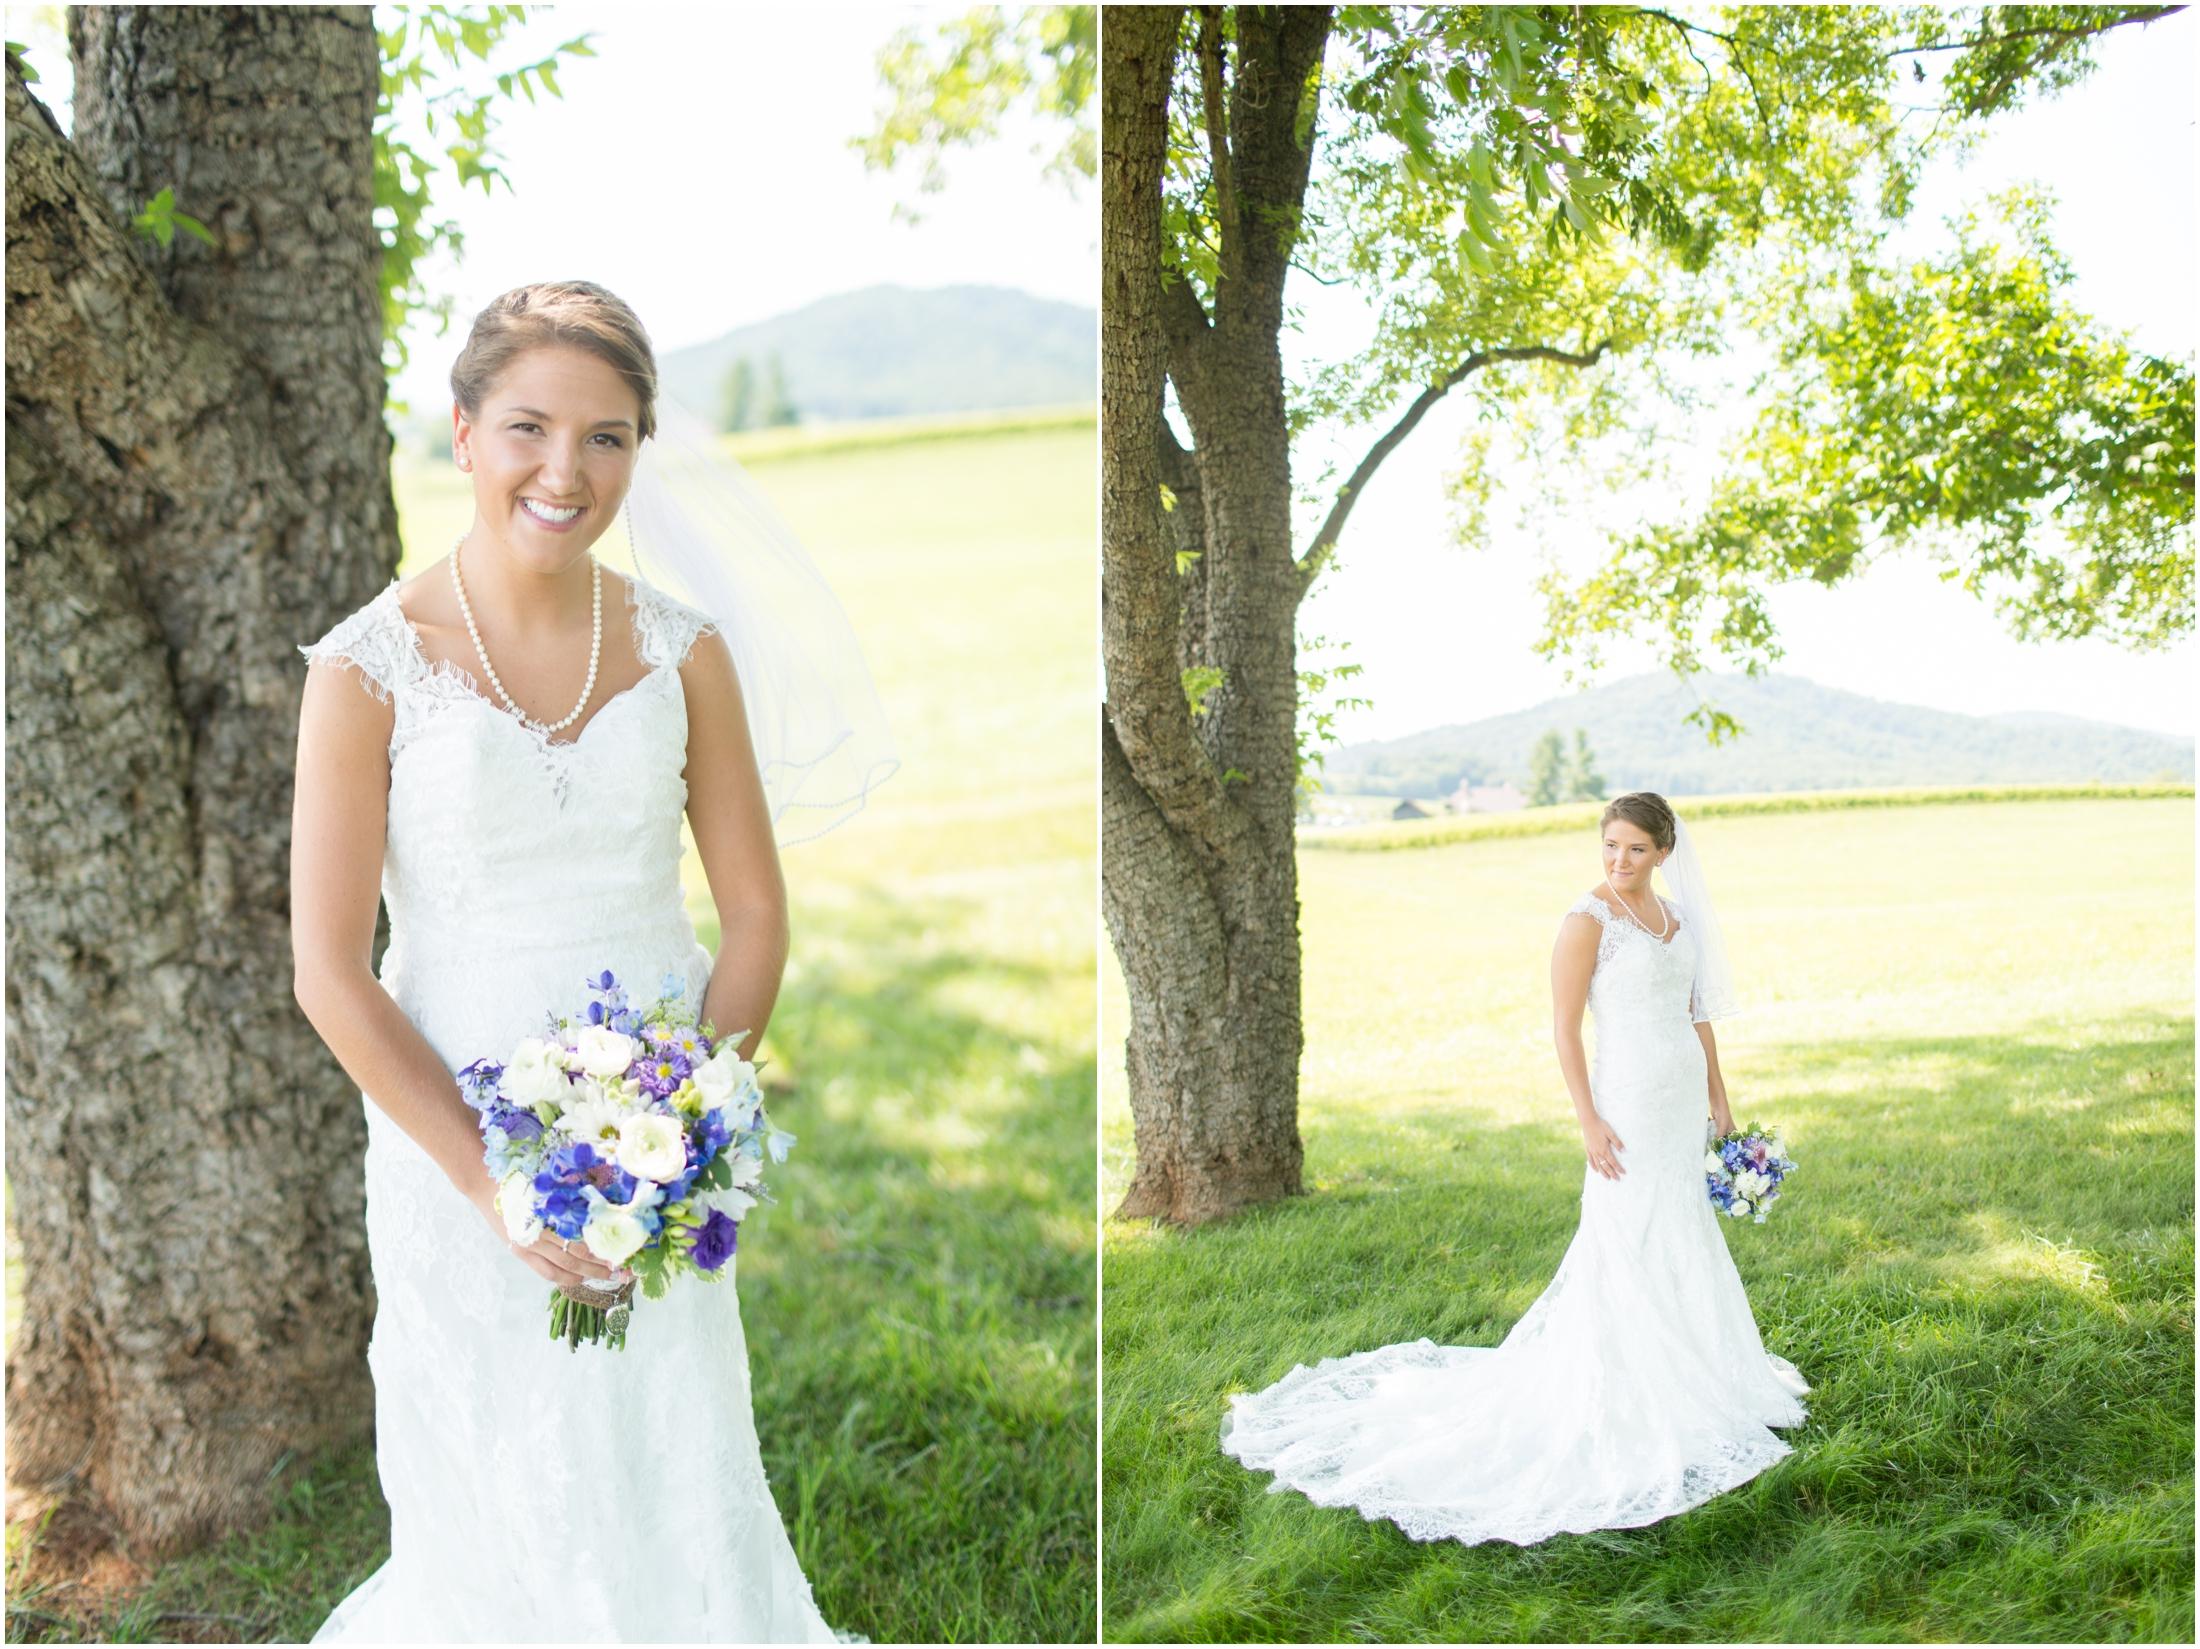 Norton-Wedding-3-Bride-and-Groom-Portraits-385.jpg